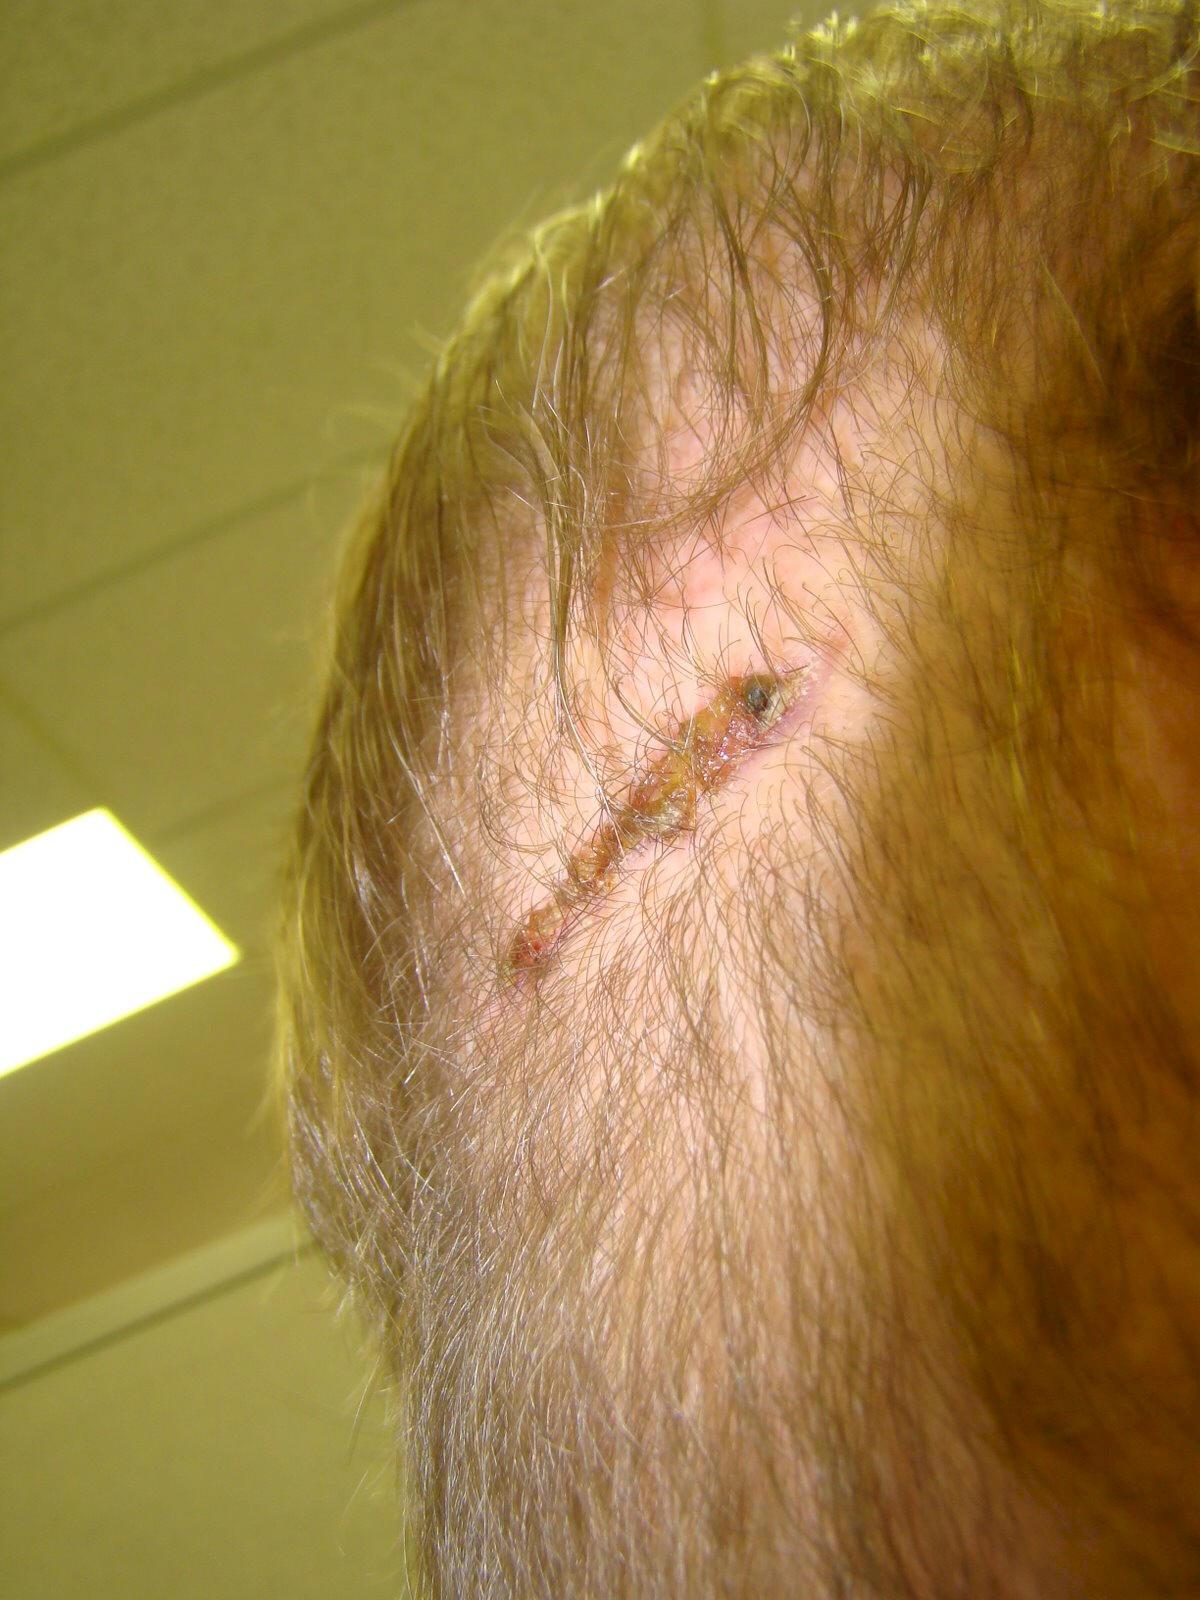 Acell hair transplant scar repair photo 1 month